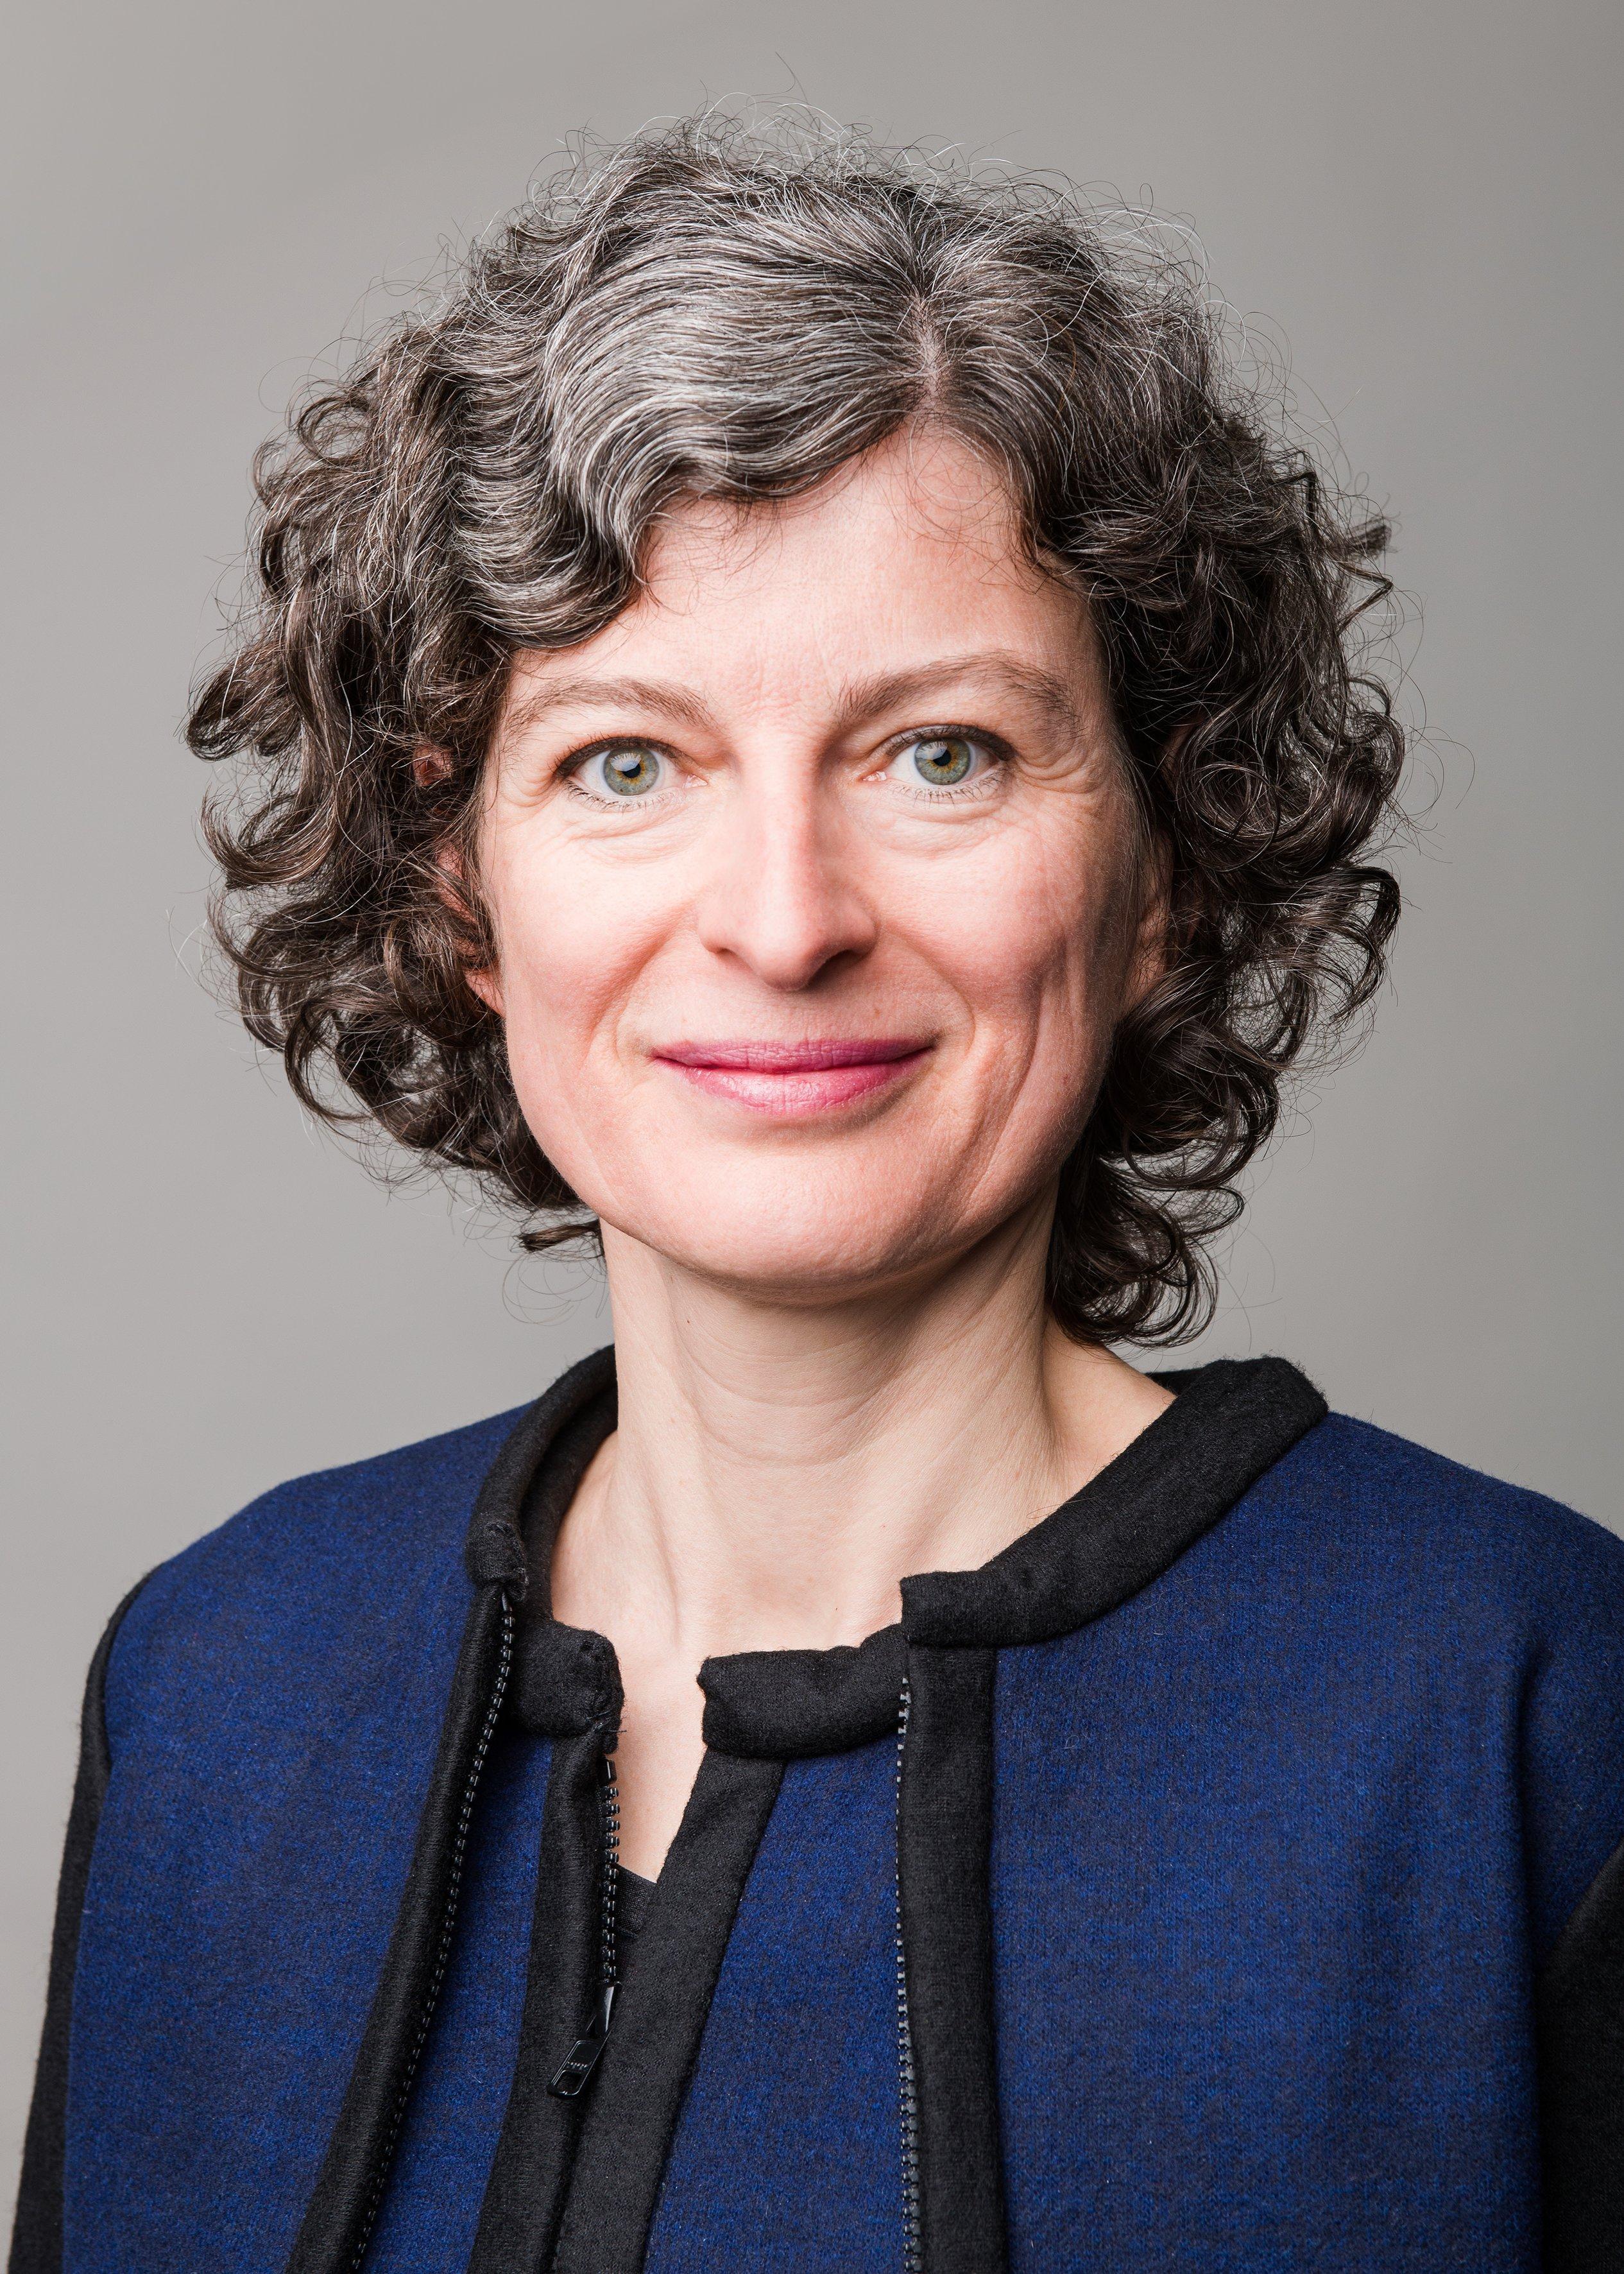 Prof. Dr. Christina Thurner